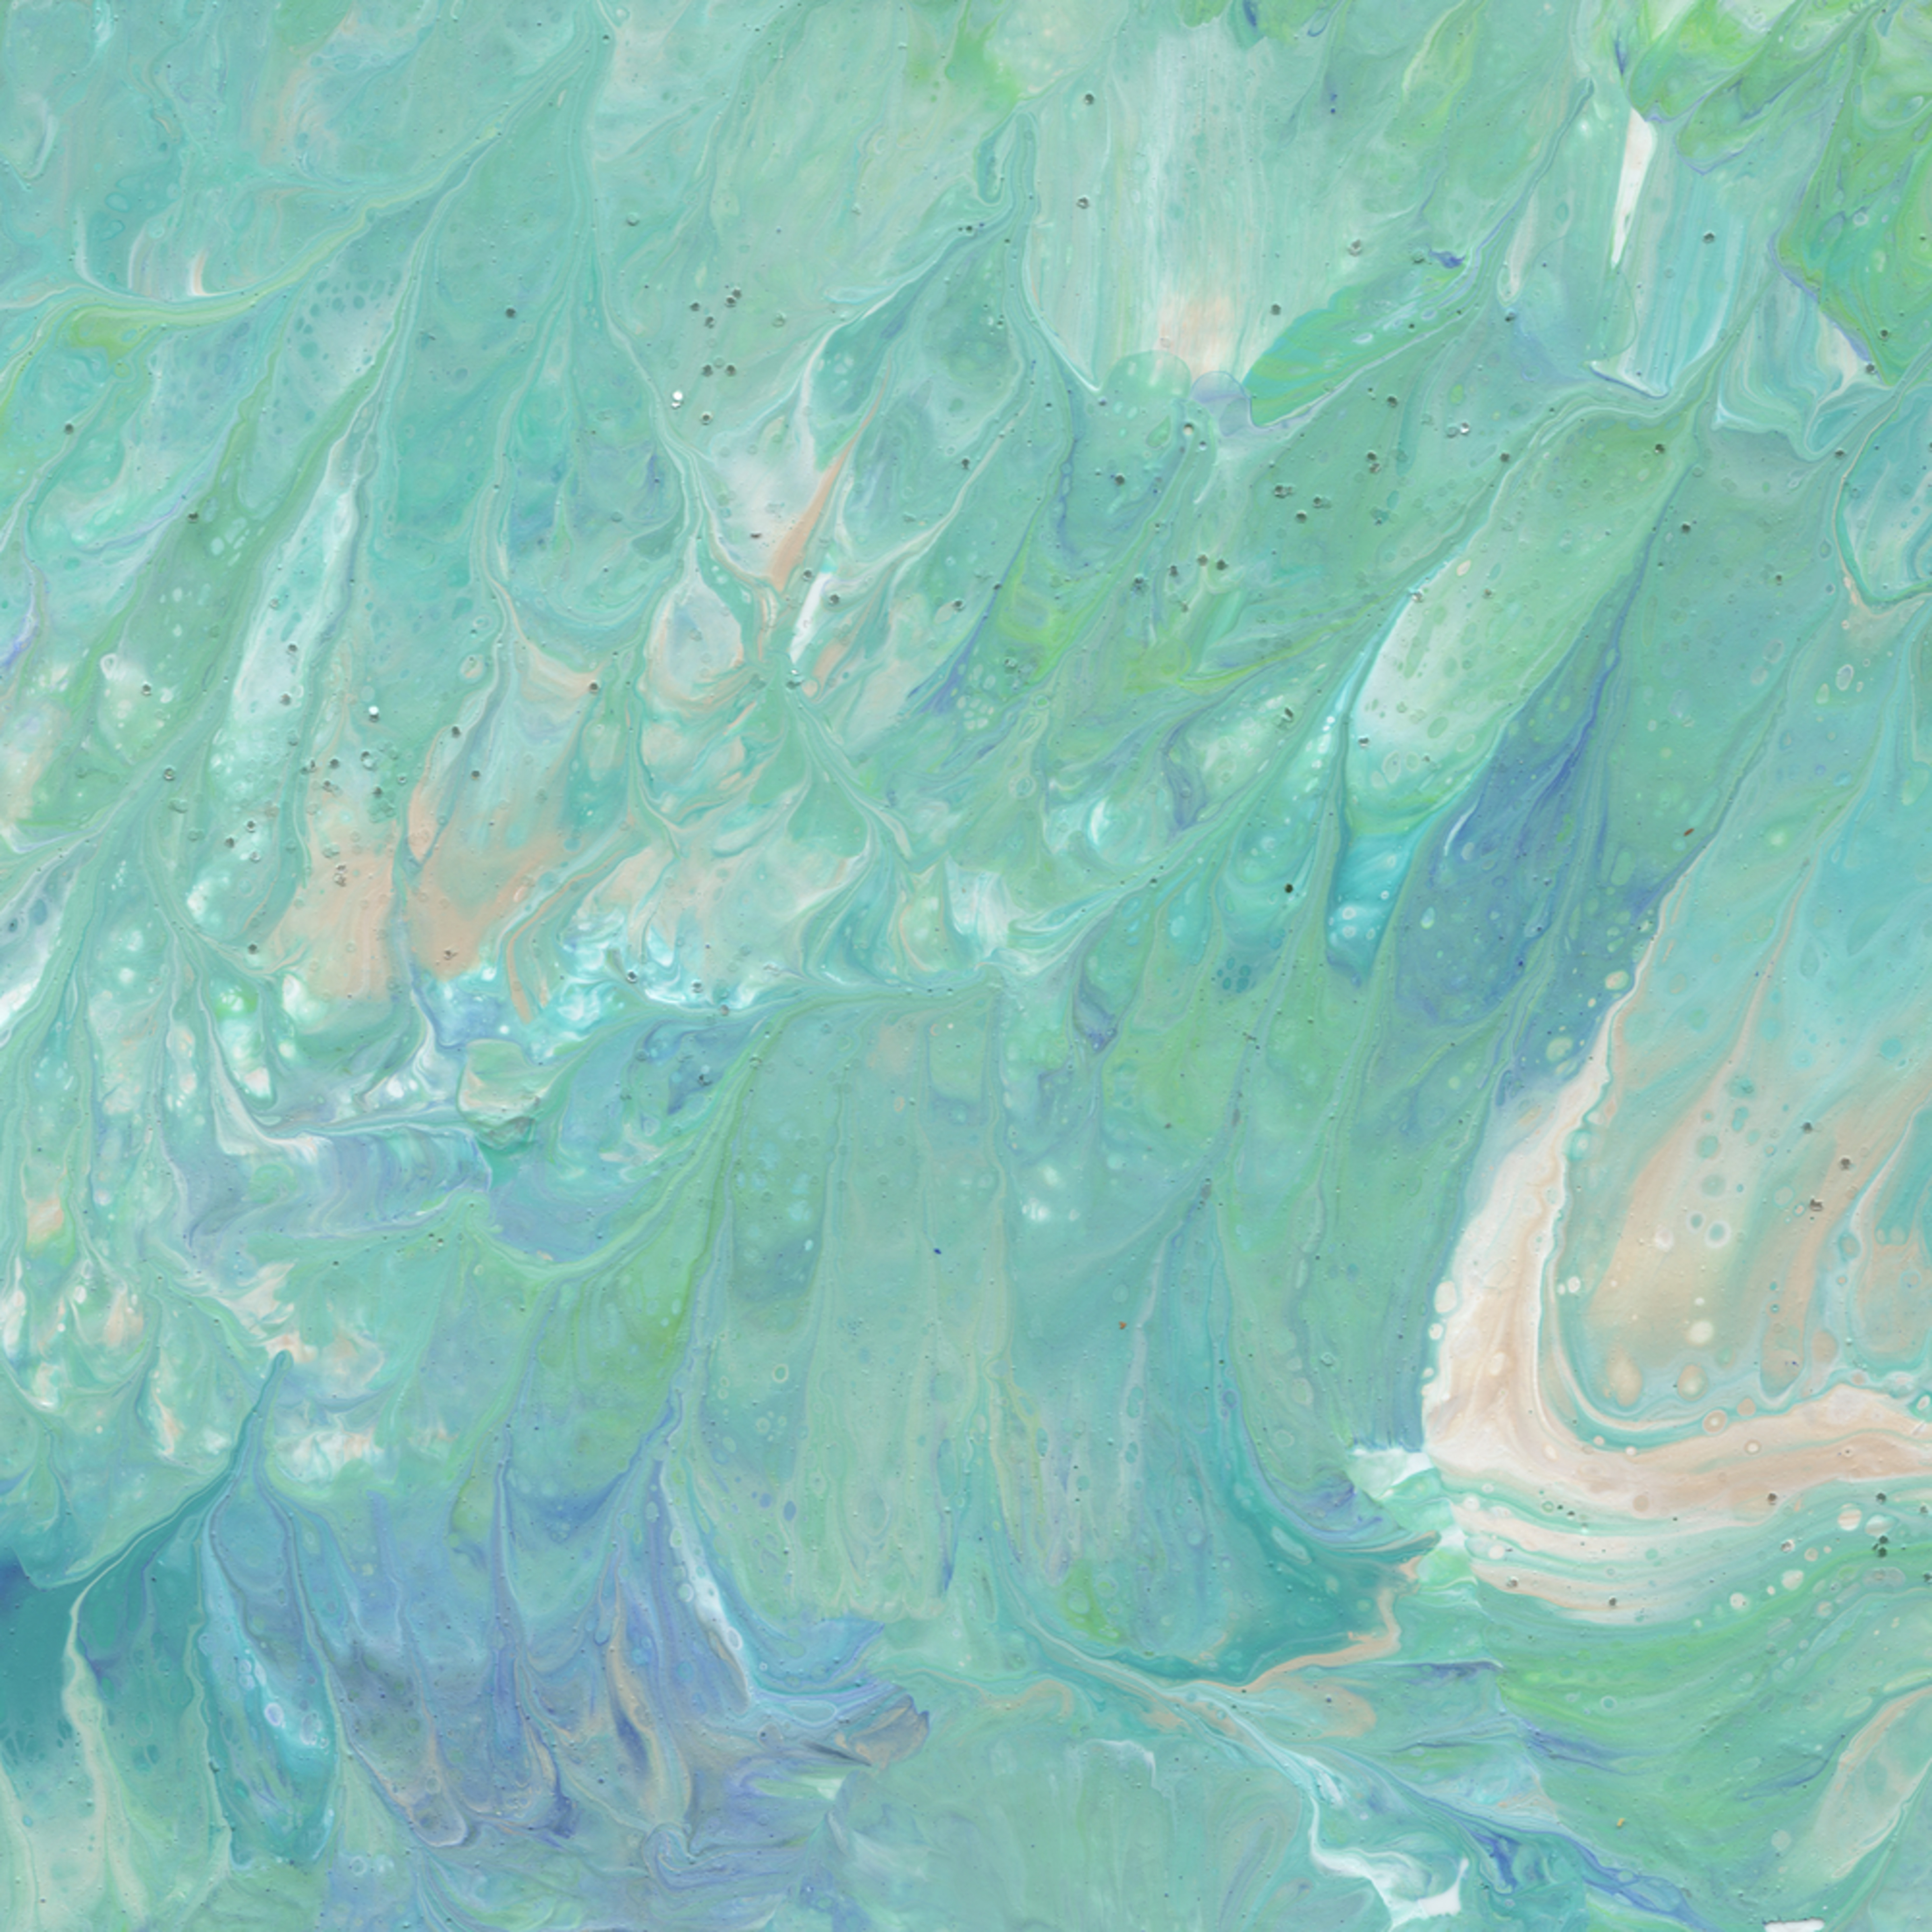 Turquoise waters 3 p6rrwb